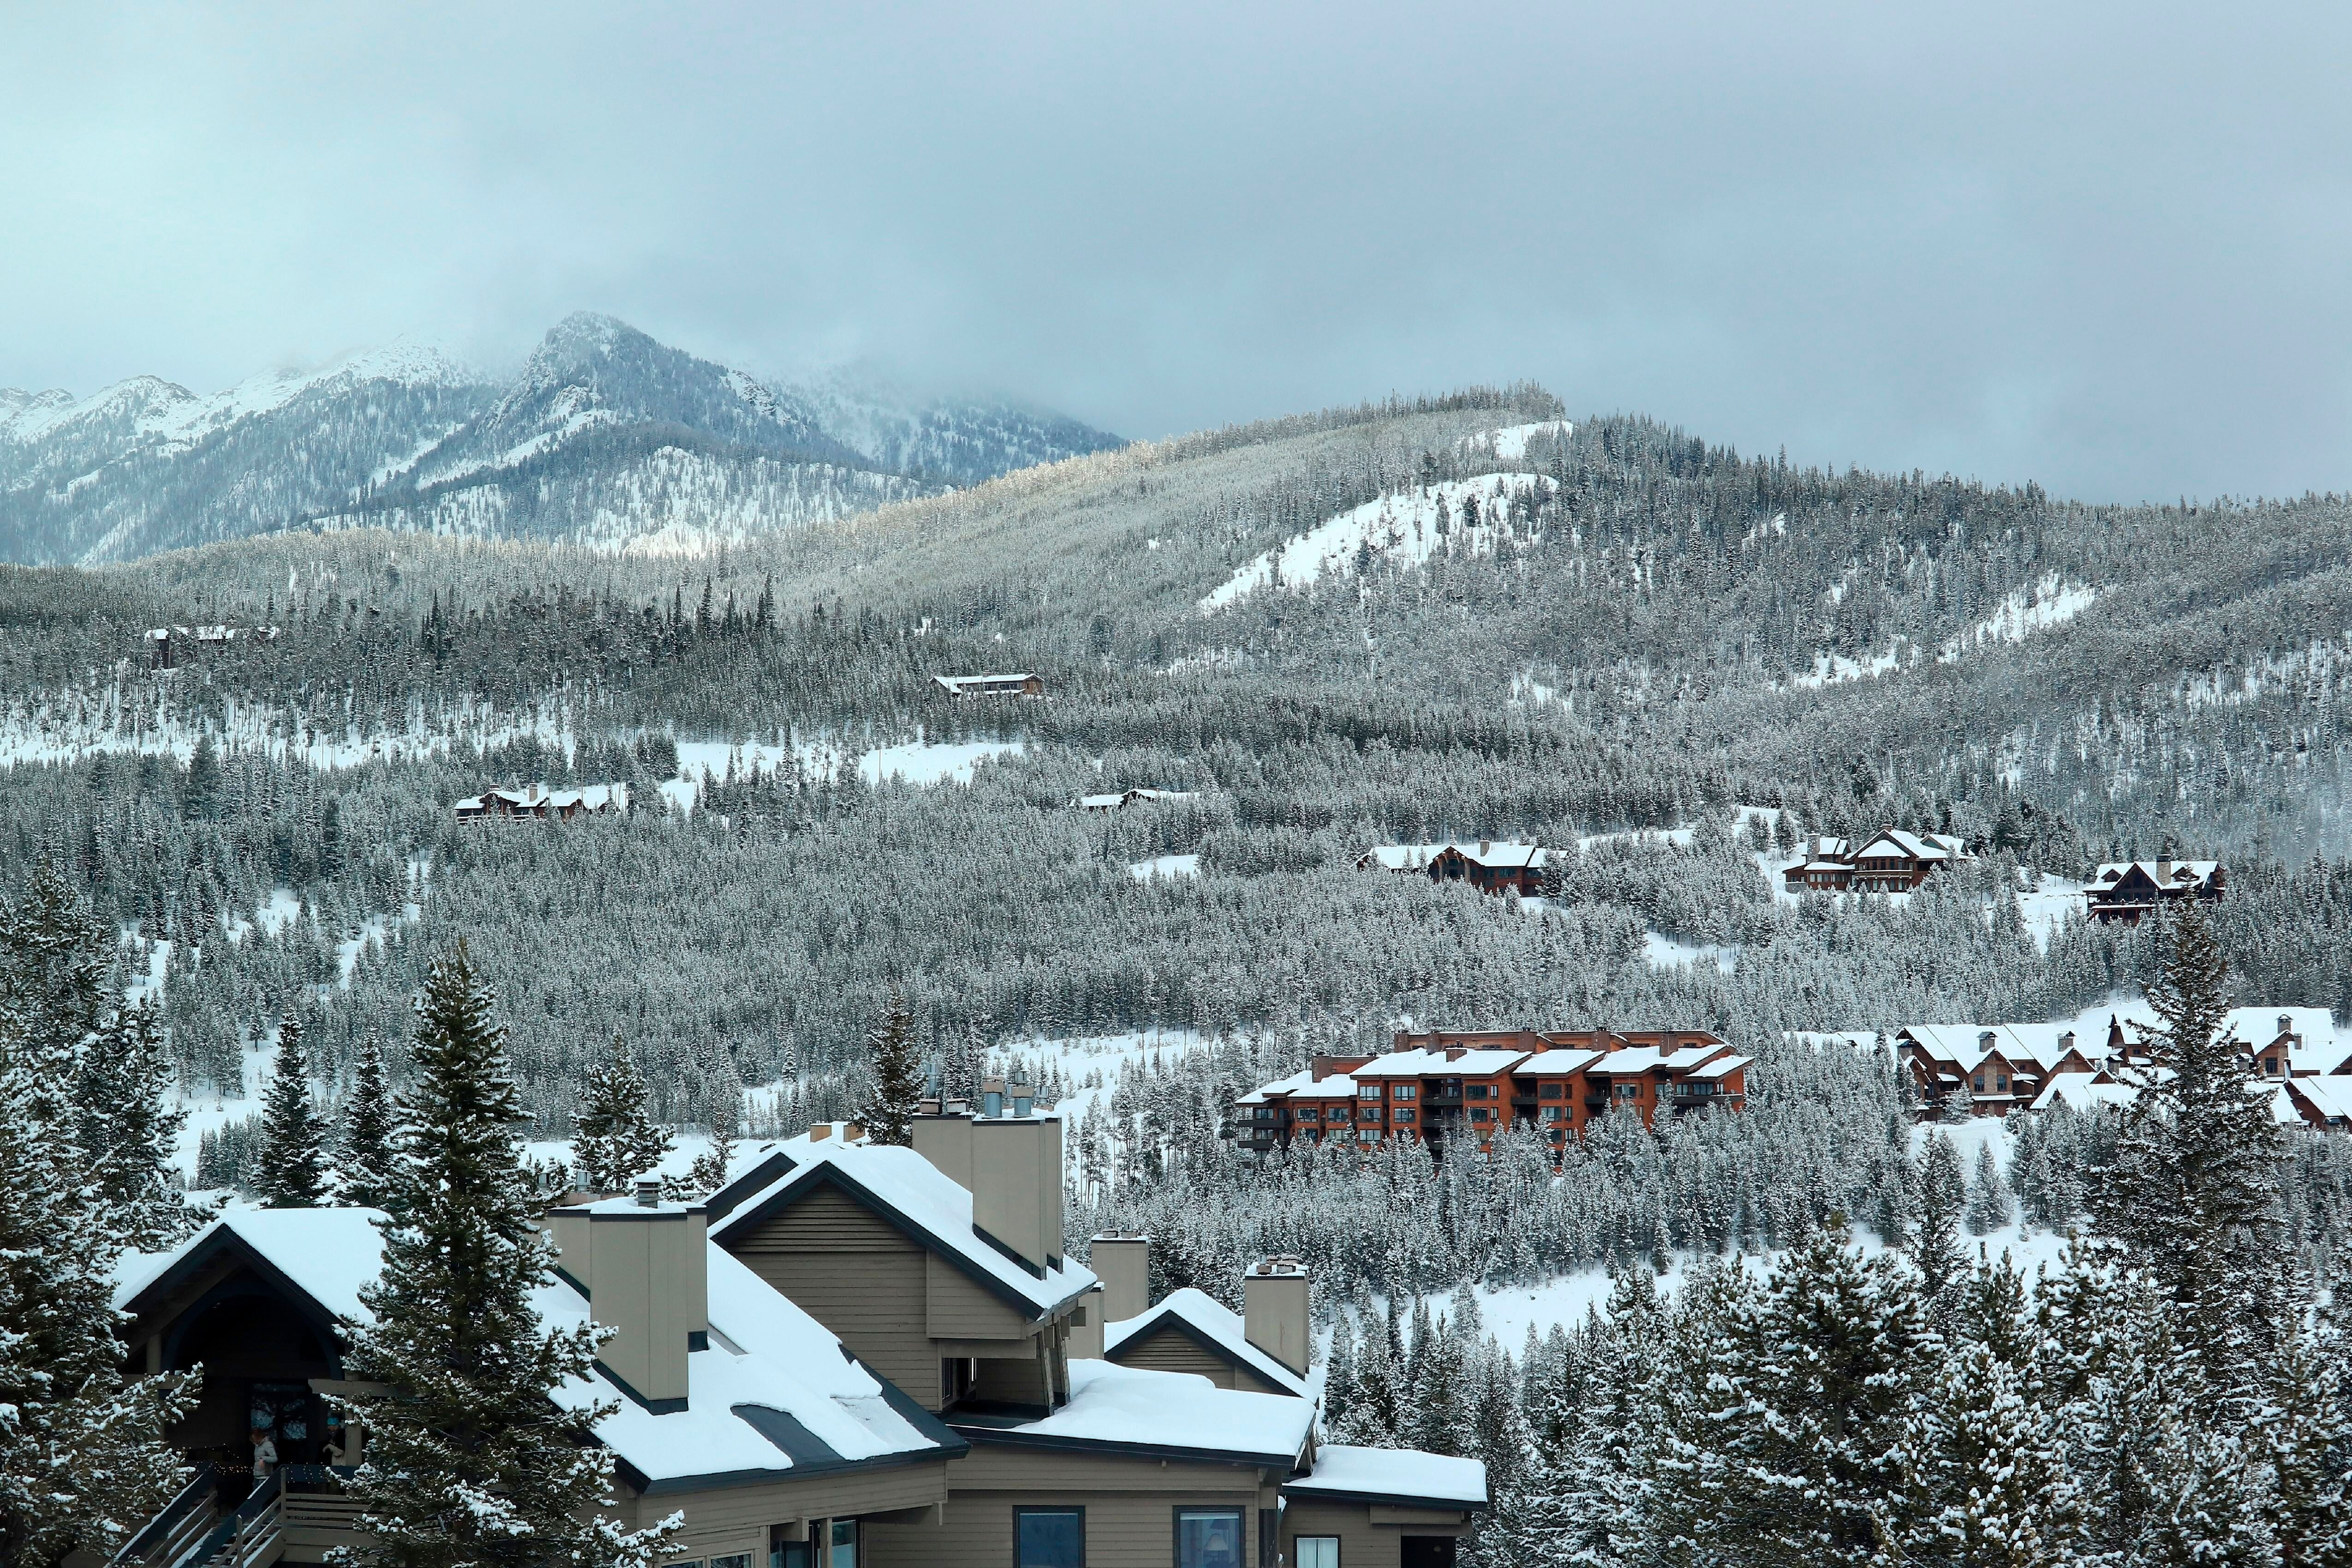 Condos and housing in the mountains around Big Sky Ski Resort.